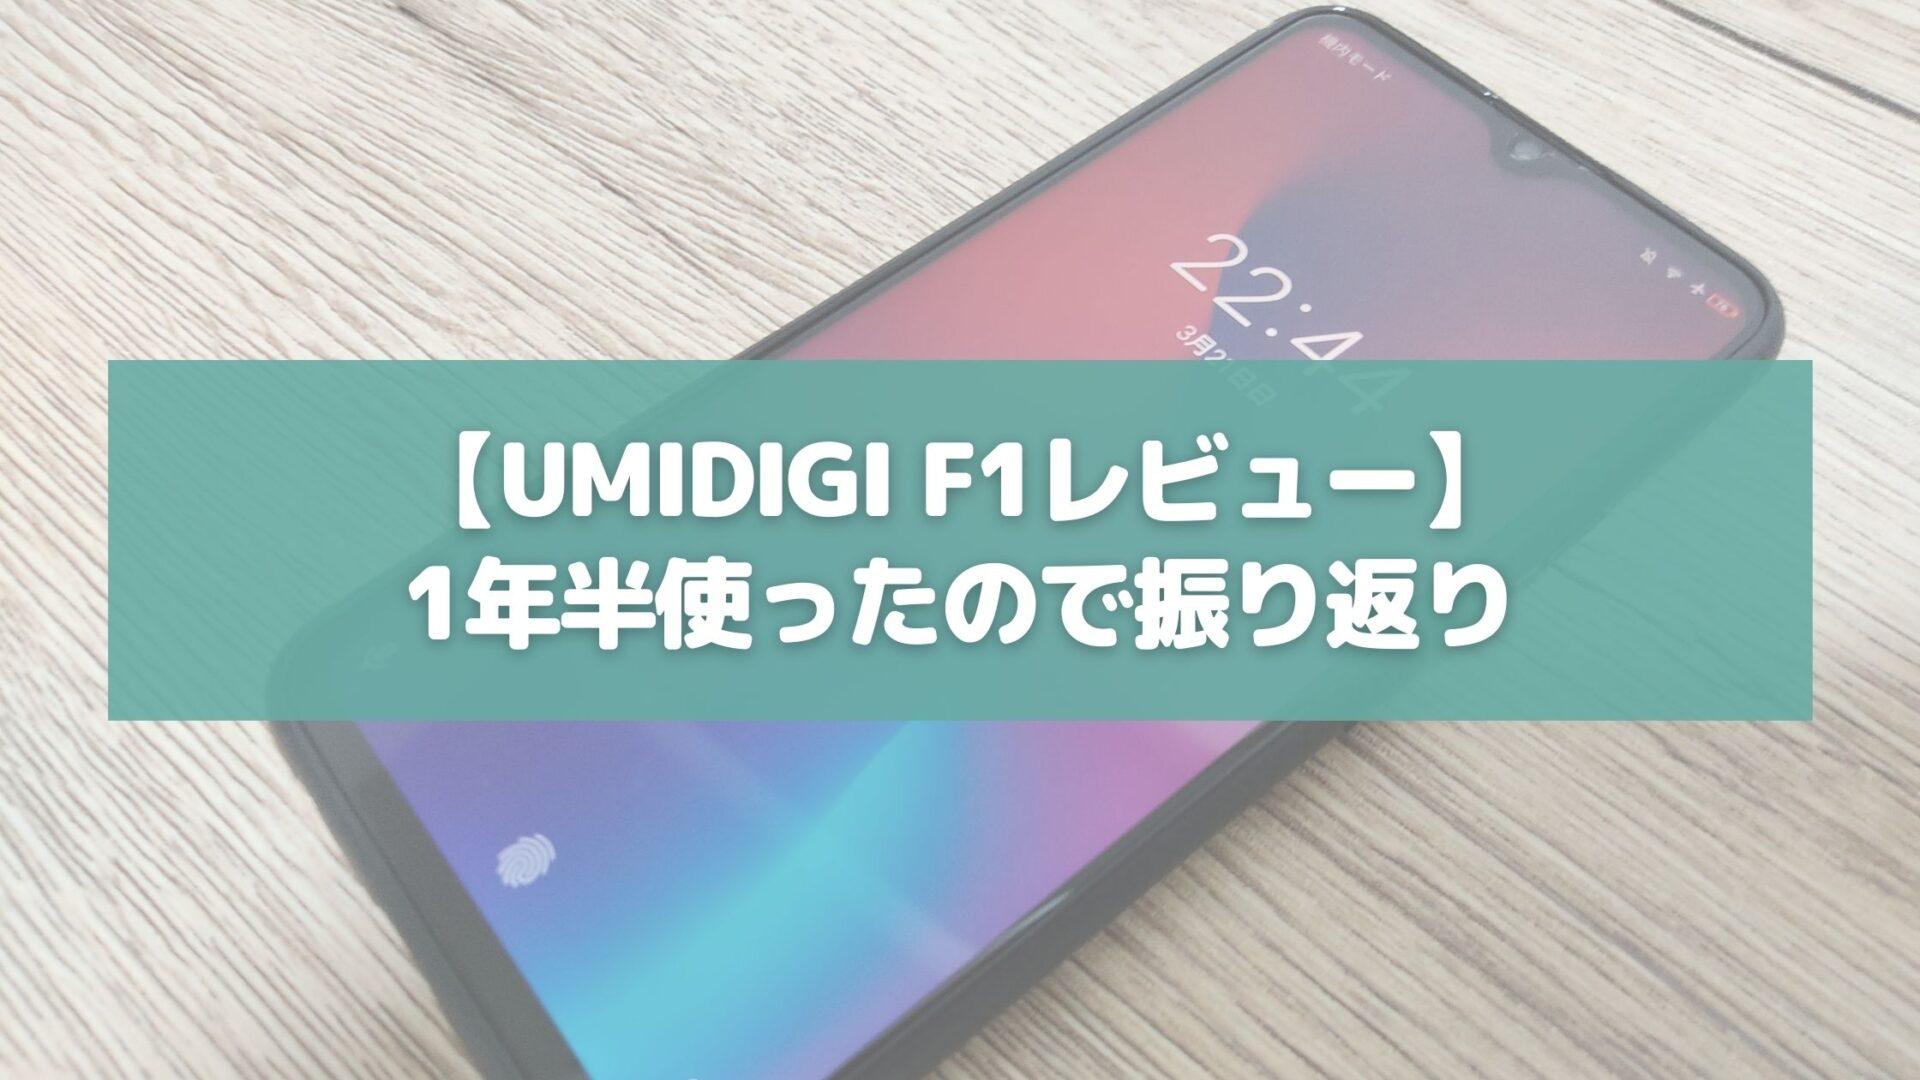 UMIDIGI F1レビュー